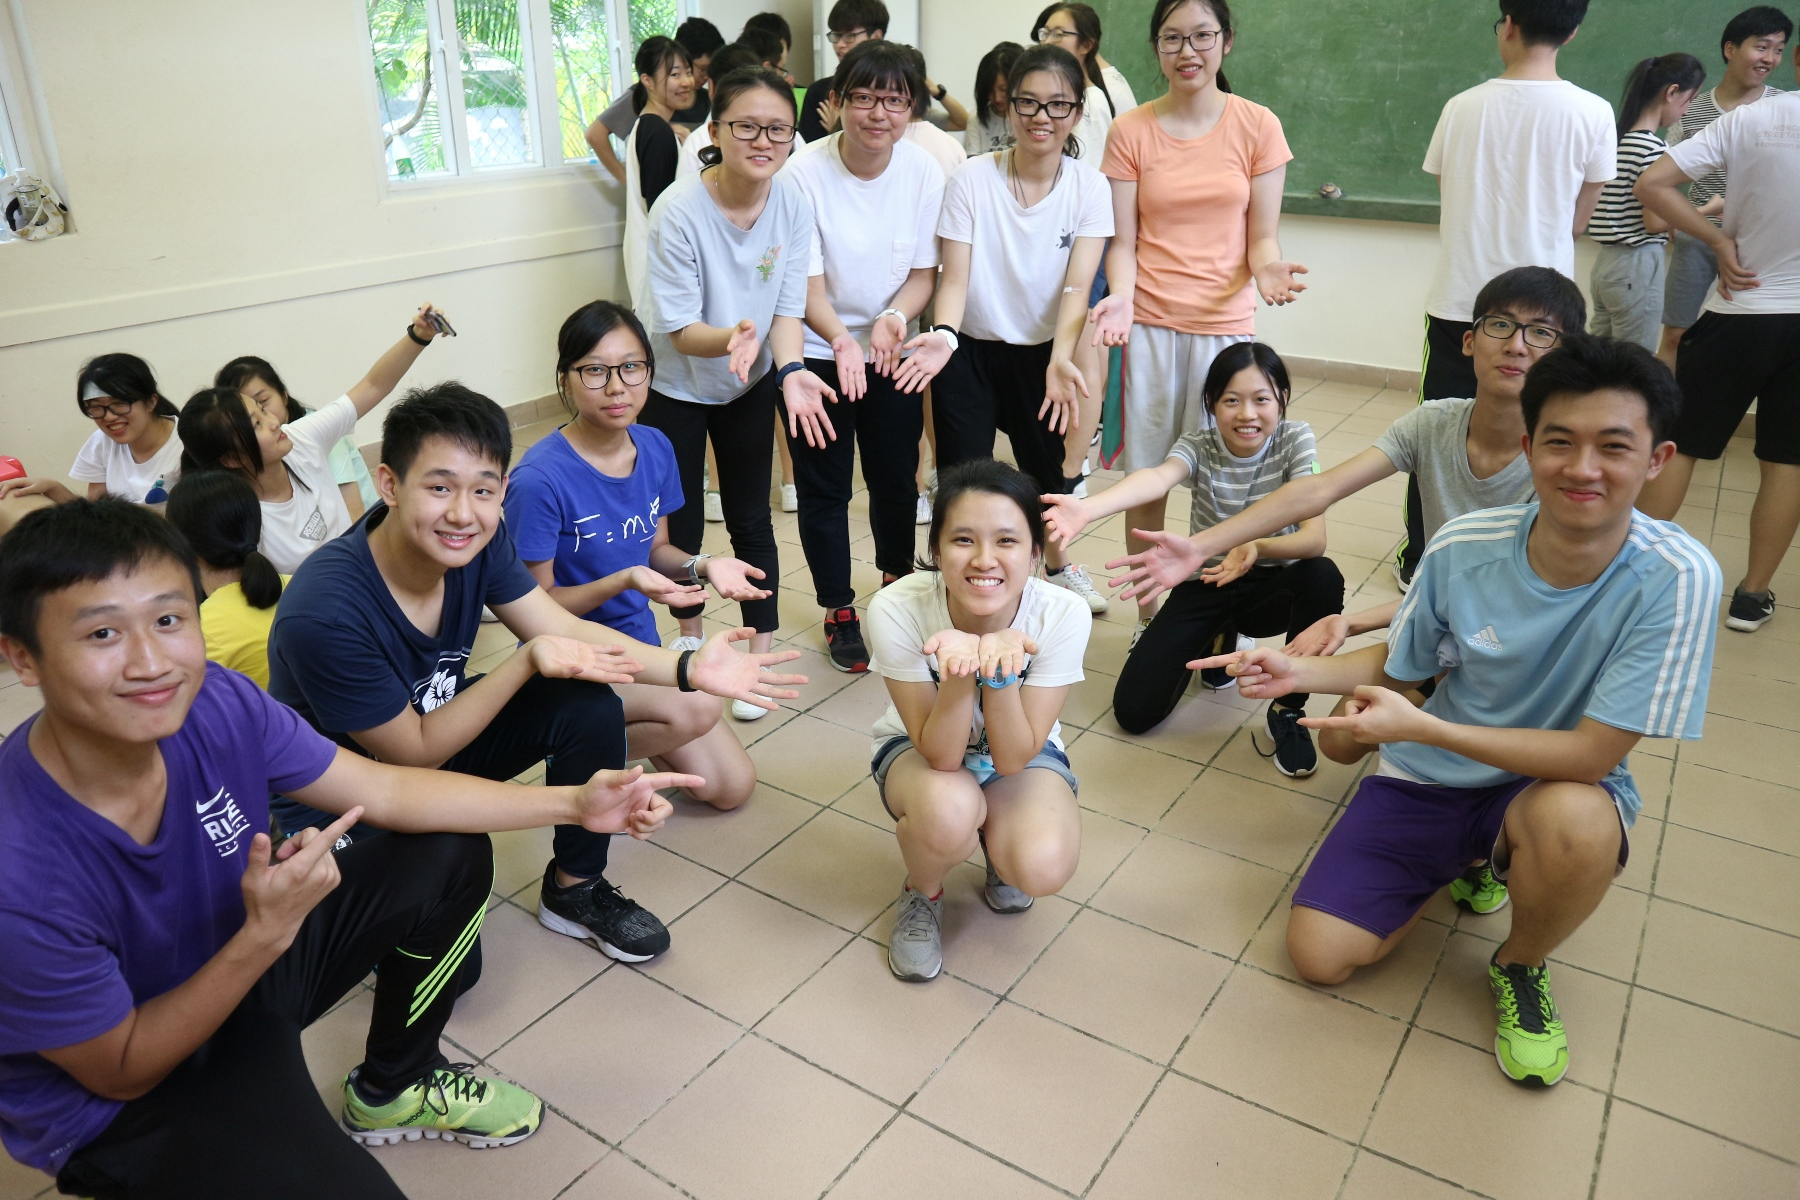 http://www.npc.edu.hk/sites/default/files/img_3396.jpg